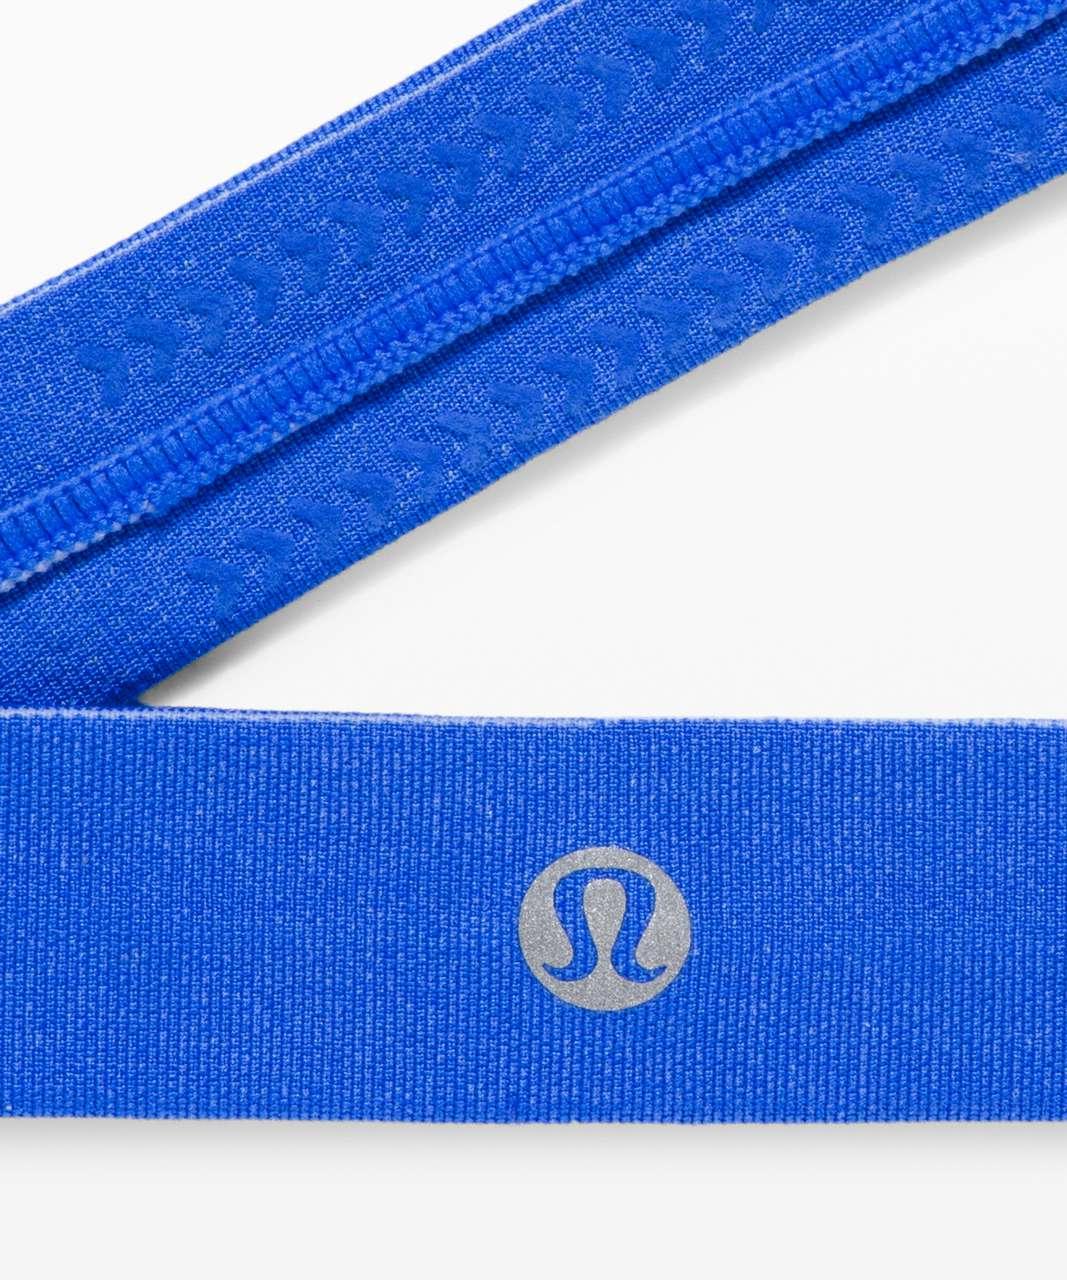 Lululemon Cardio Cross Trainer Headband - Wild Bluebell / White